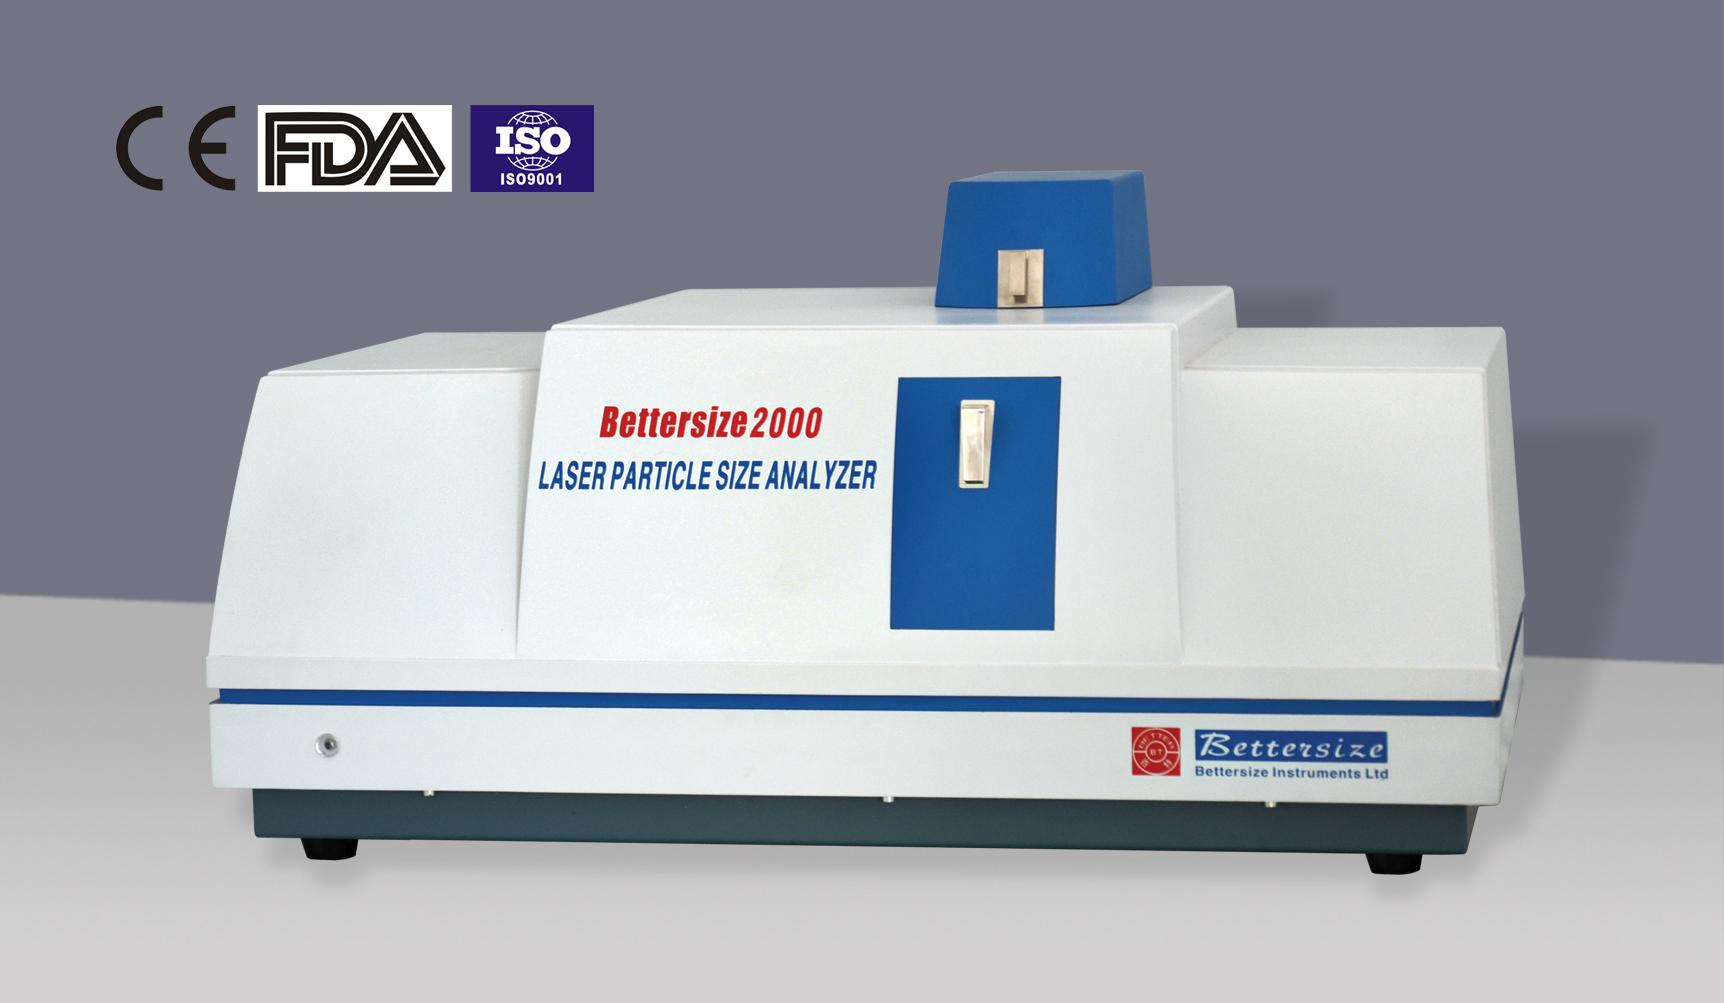 Bettersize 2000 Intelligent Laser Particle Size Analyzer